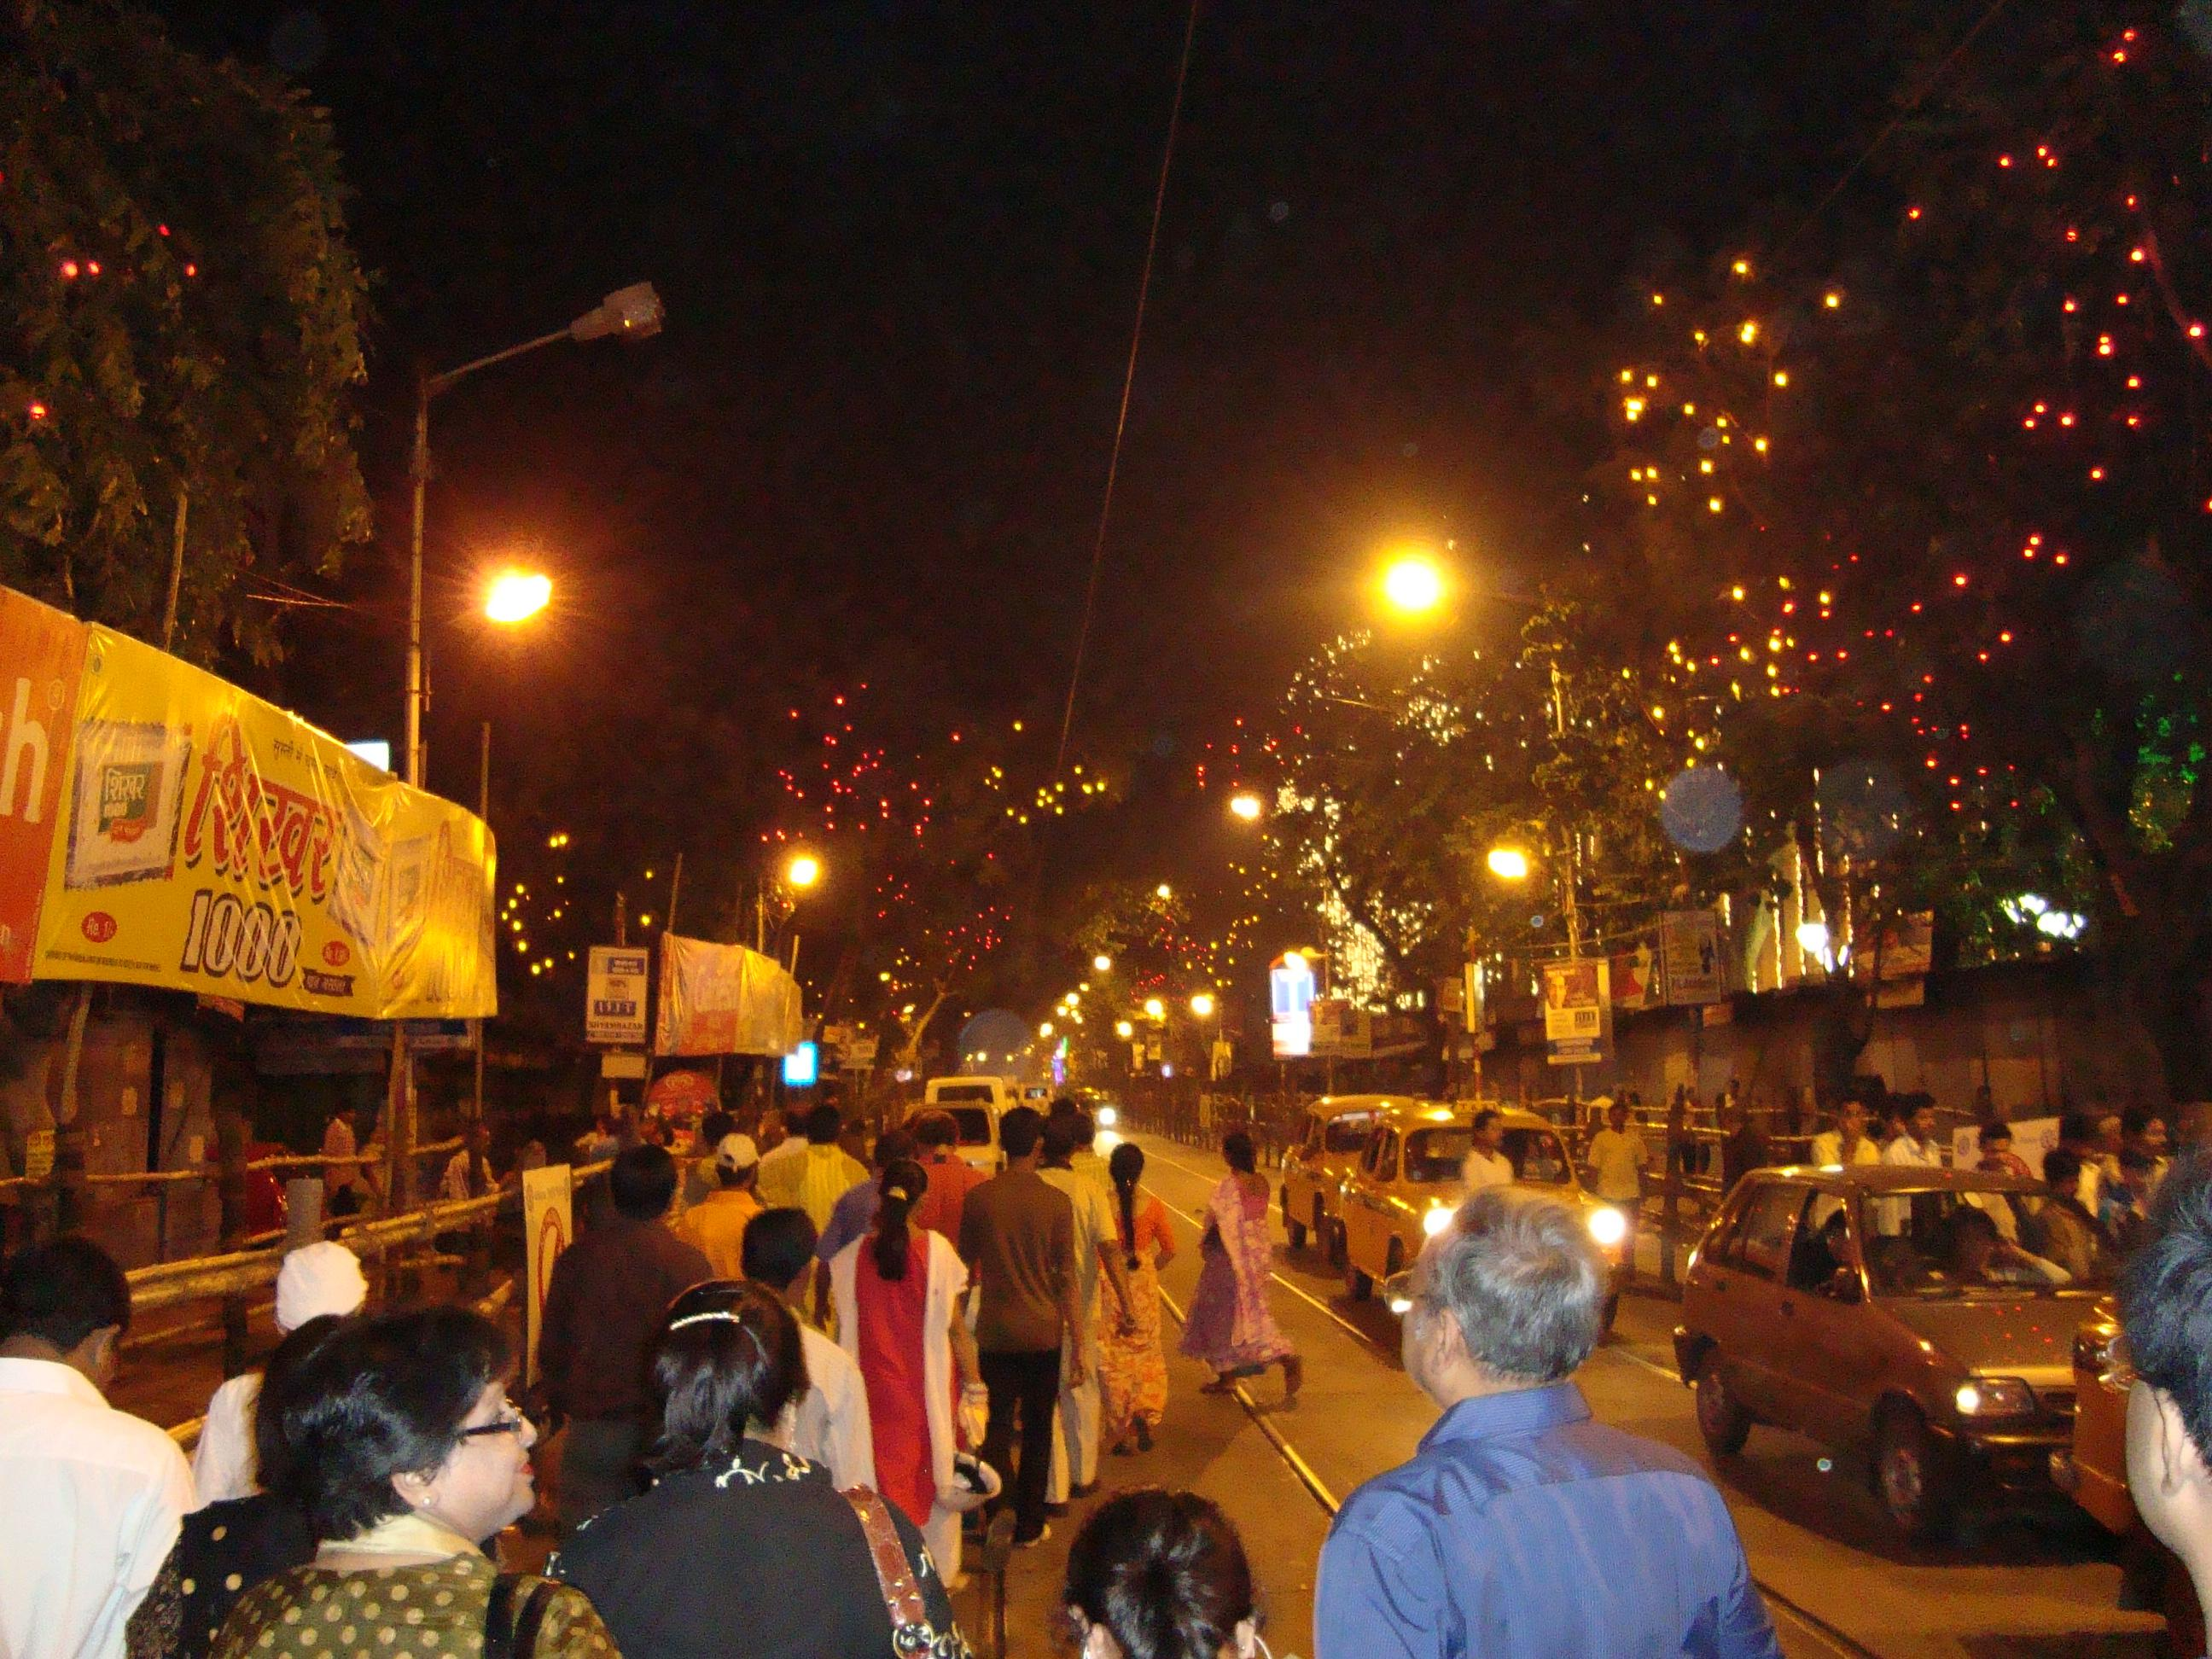 Streets at nite during Durga Puja